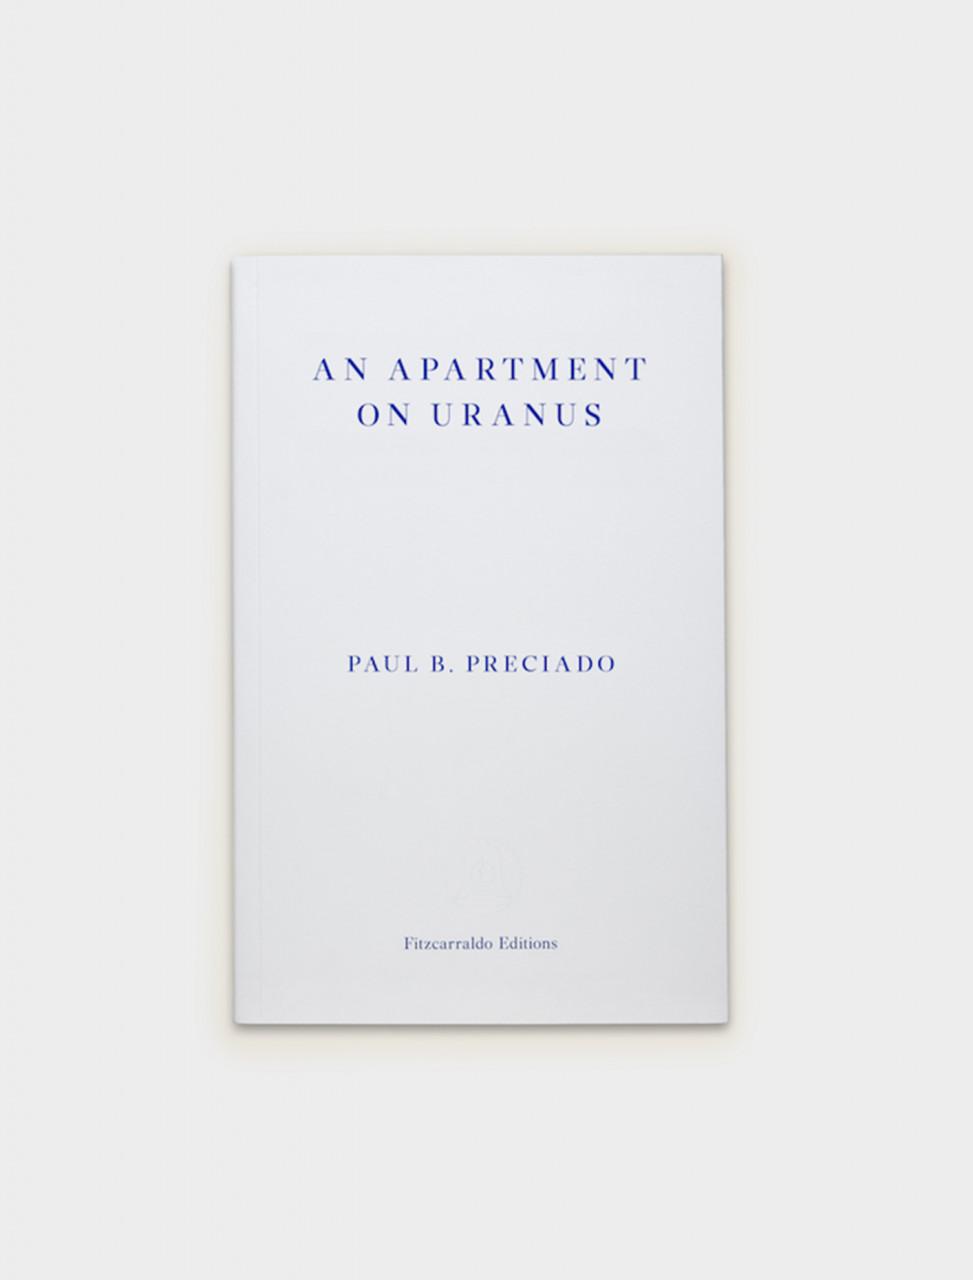 9781913097073  Fitzcarraldo Editions An Apartment on Uranus - Paul B. Preciado